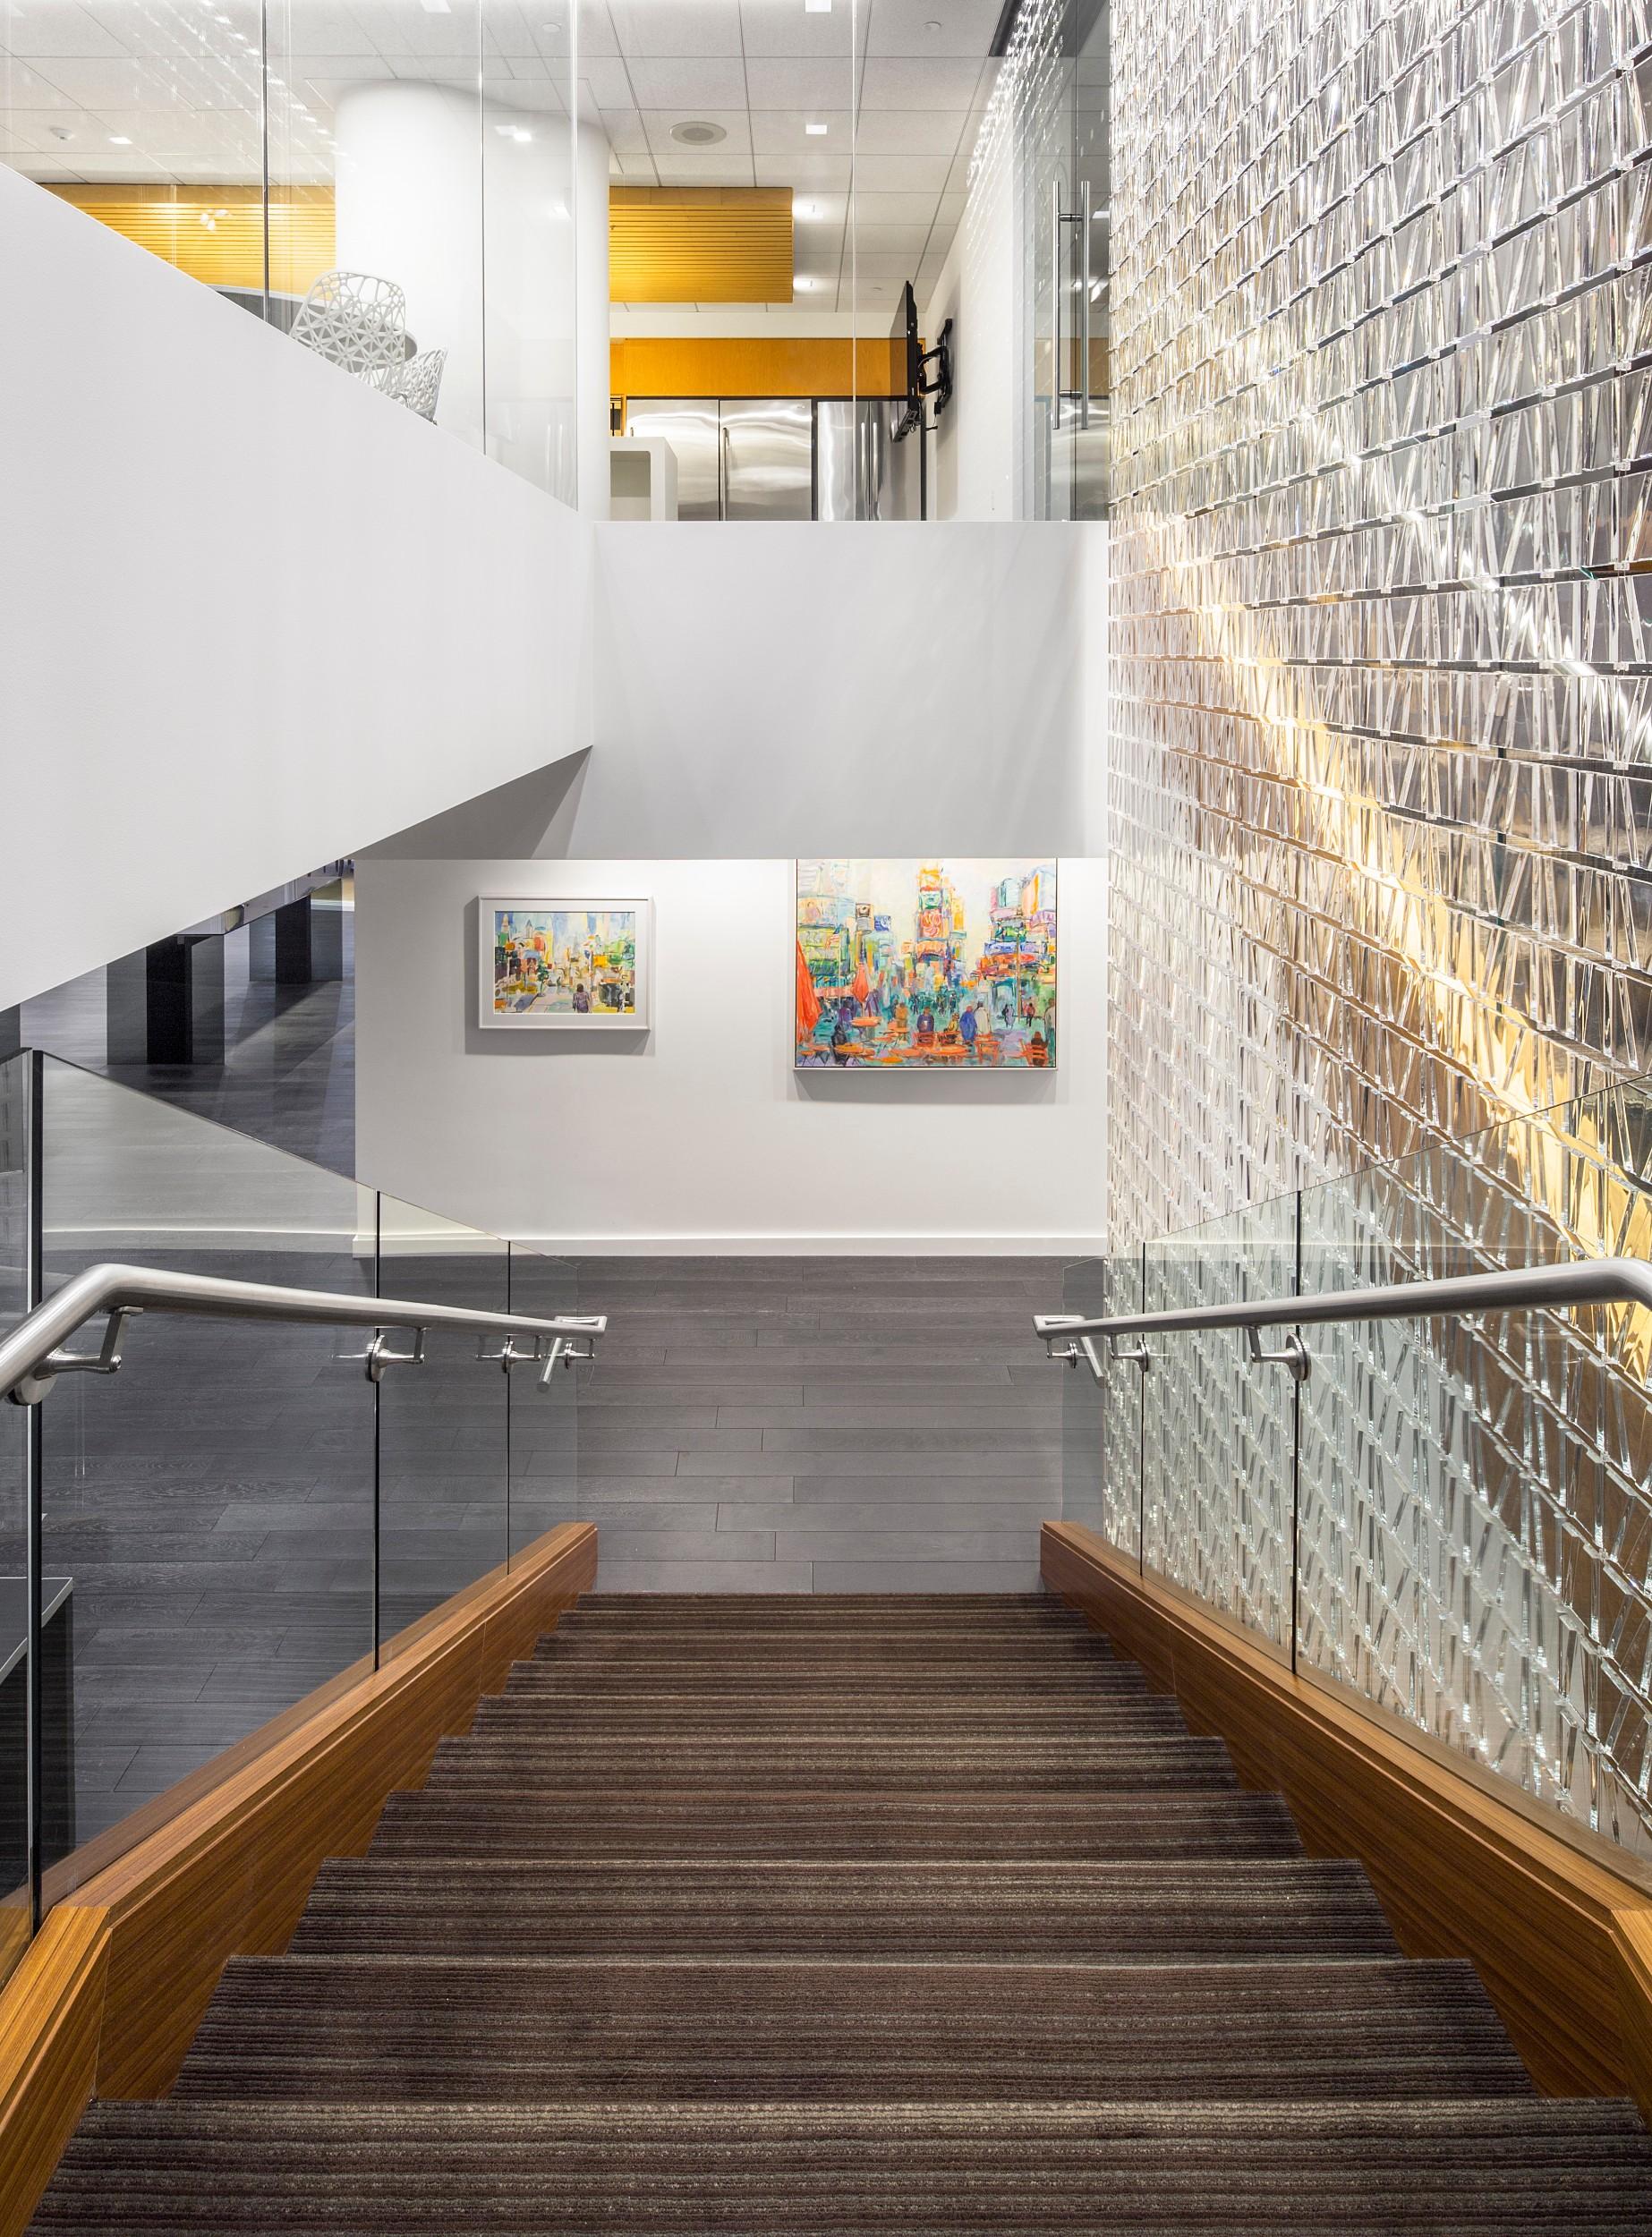 Corderman_Confidential_Construction_Staircase.jpg